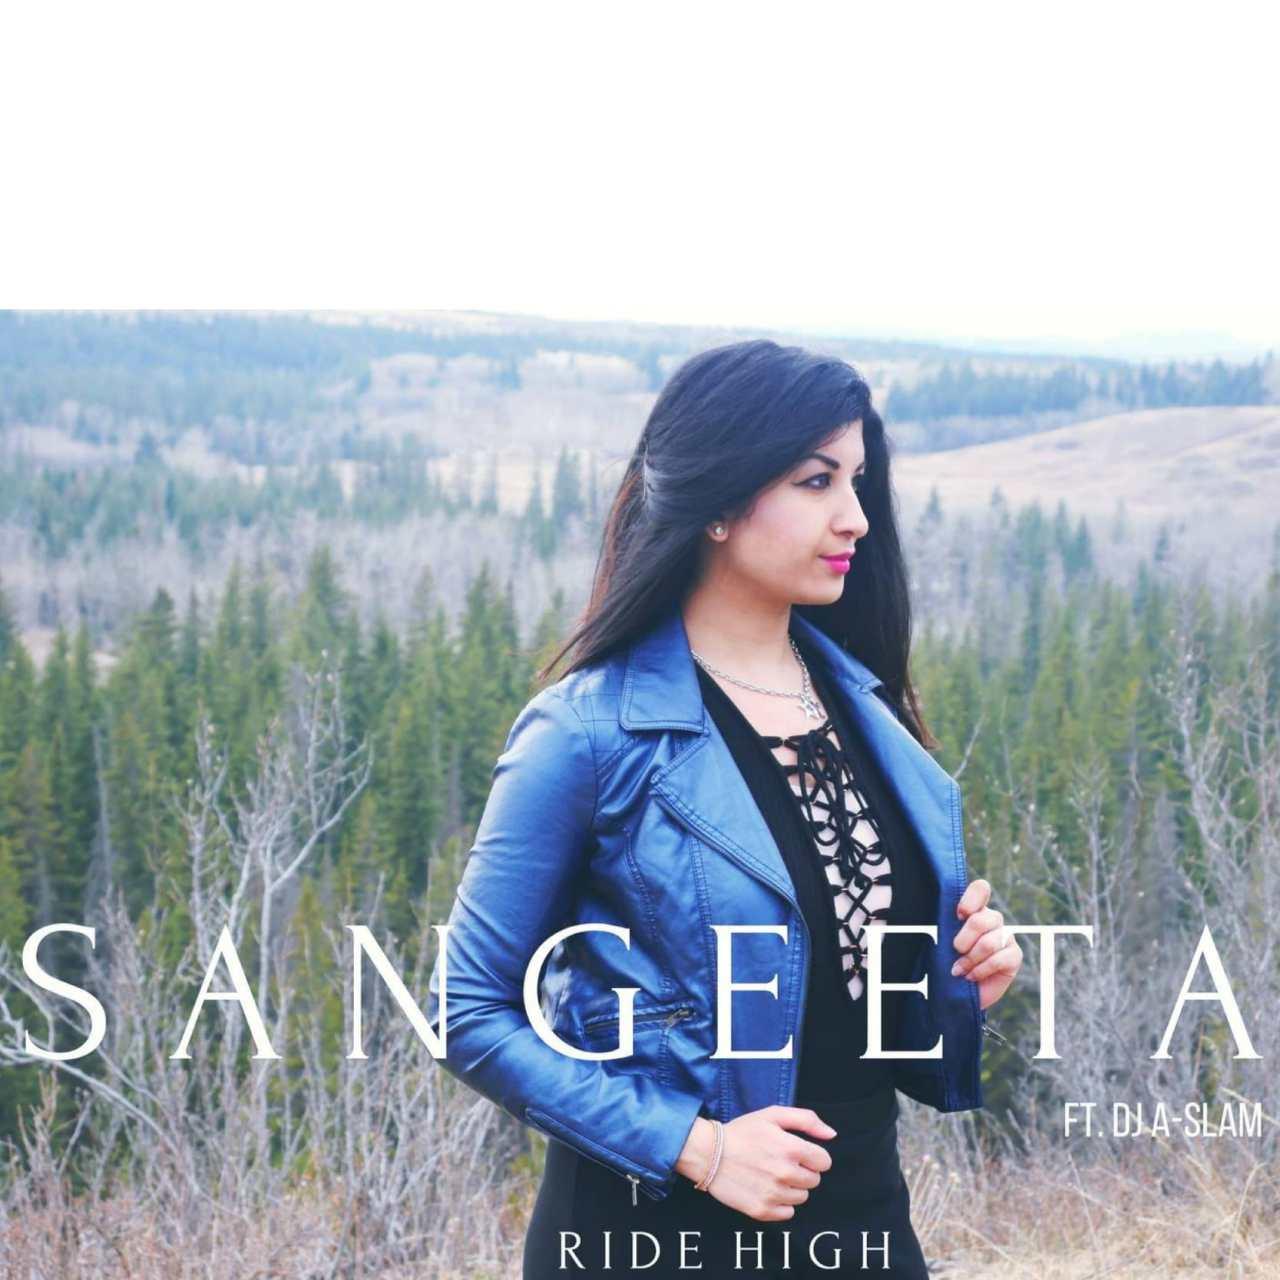 Sangeeta ride high artwork.jpg